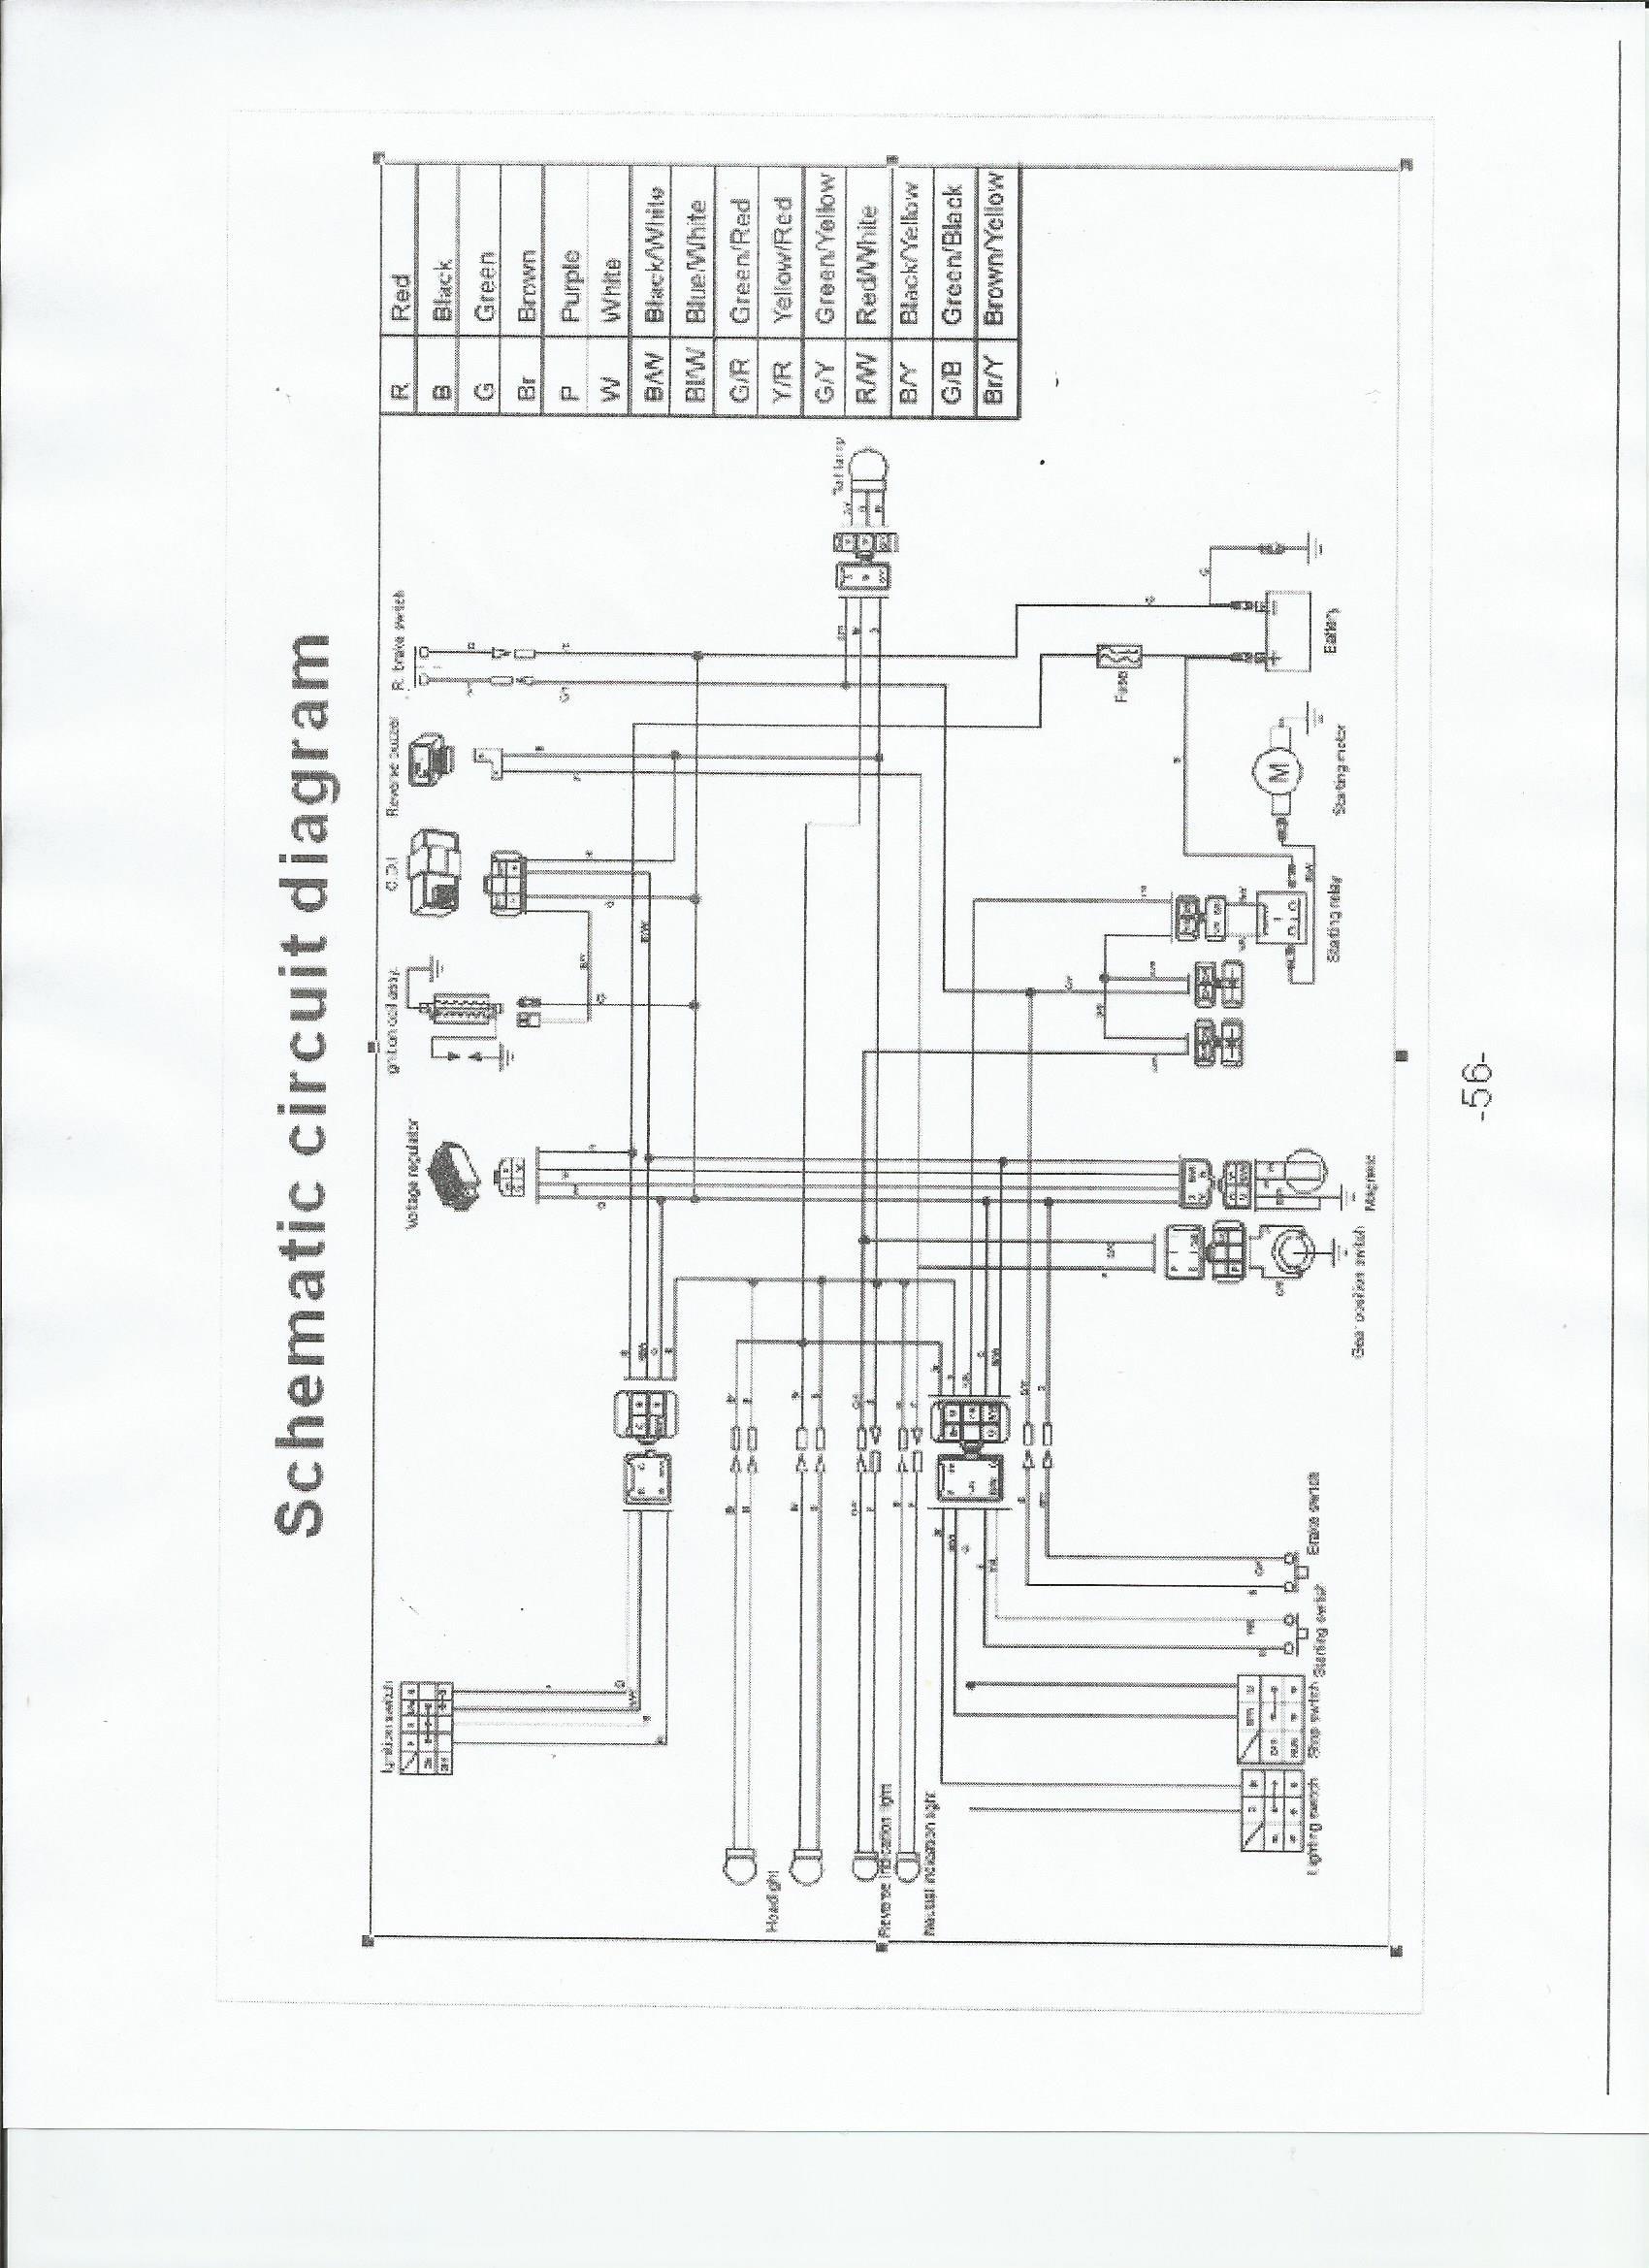 Wiring Diagram Furthermore 2002 Honda Rancher 350 Moreover Honda